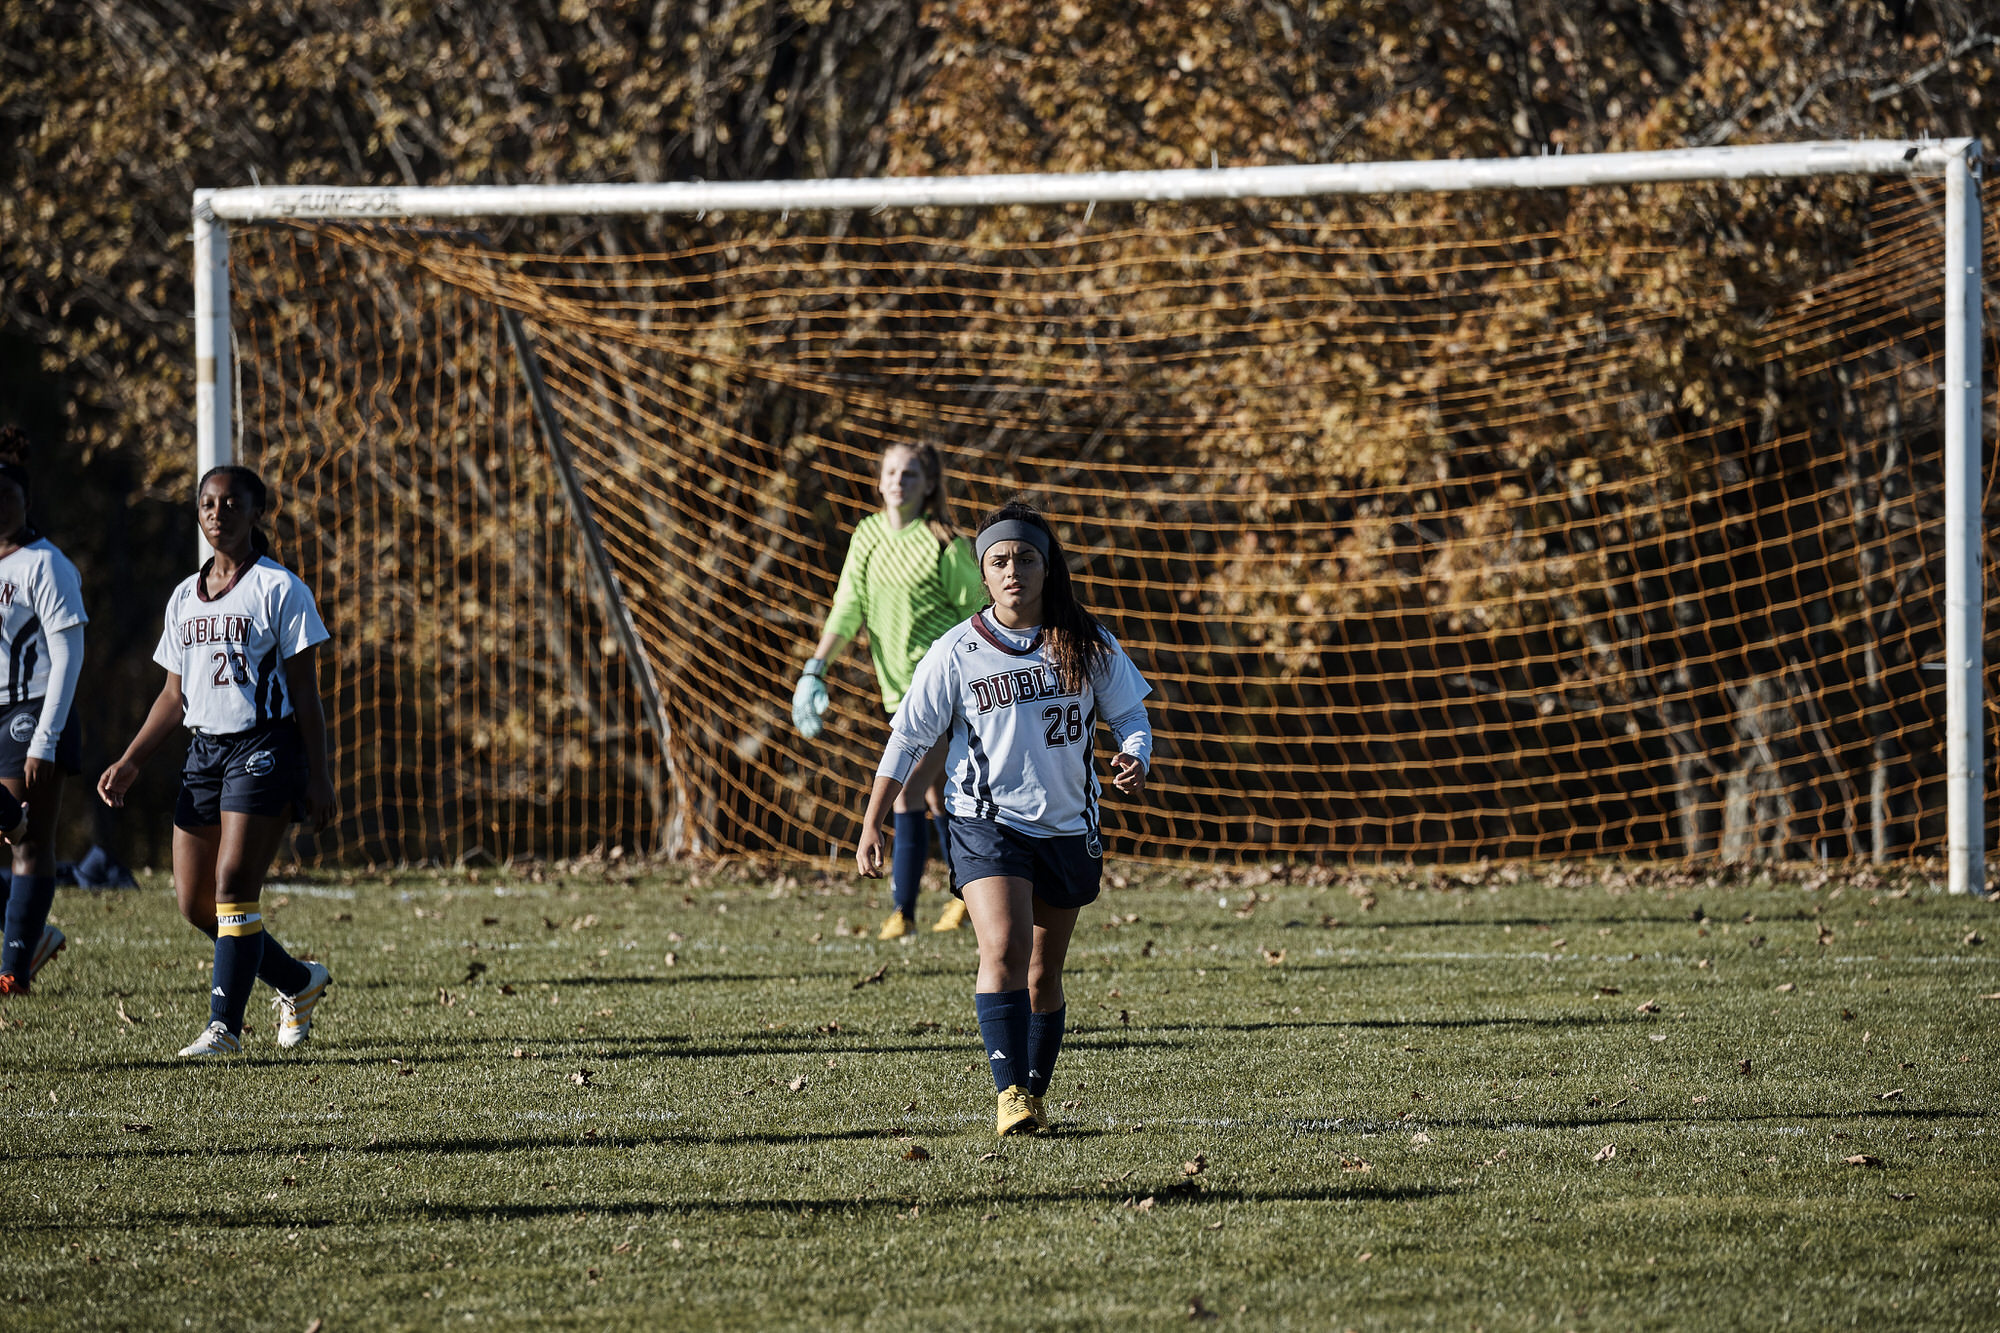 Girls Varsity Soccer vs. Putney School - October 26, 2018 - 019.jpg